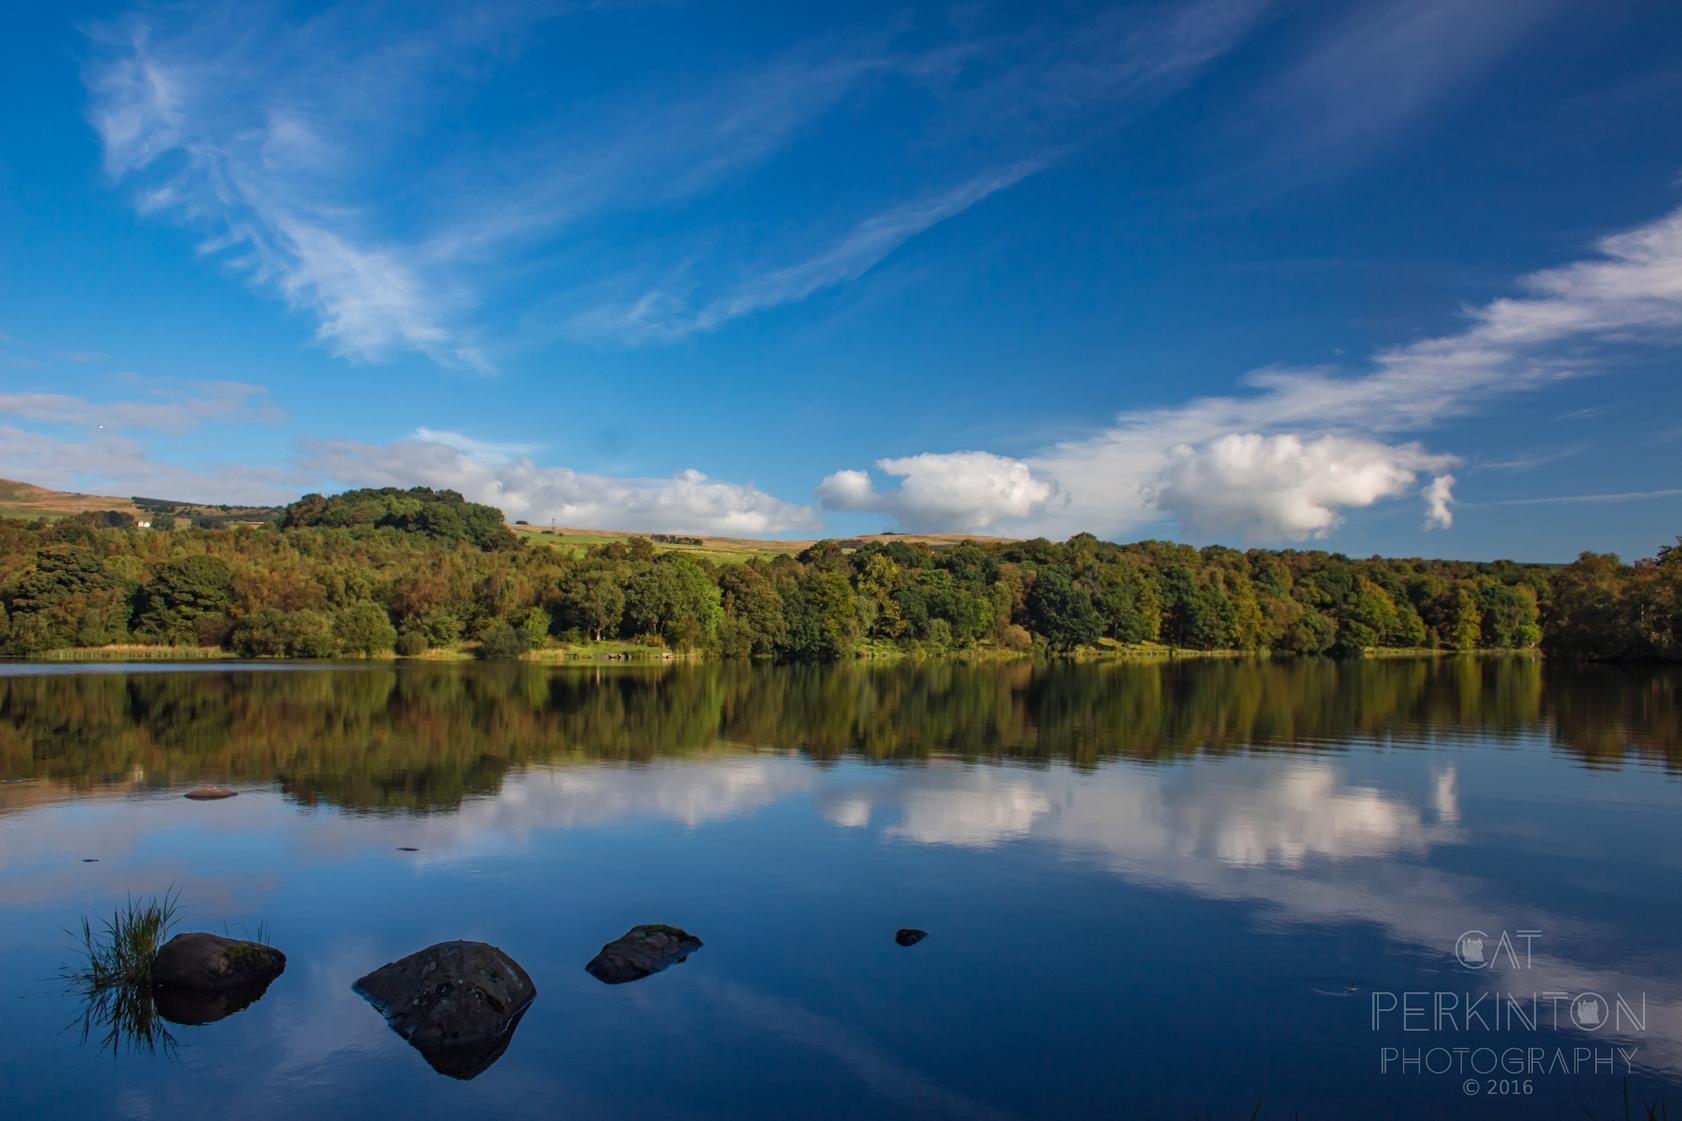 Banton Blue - Early Autumn